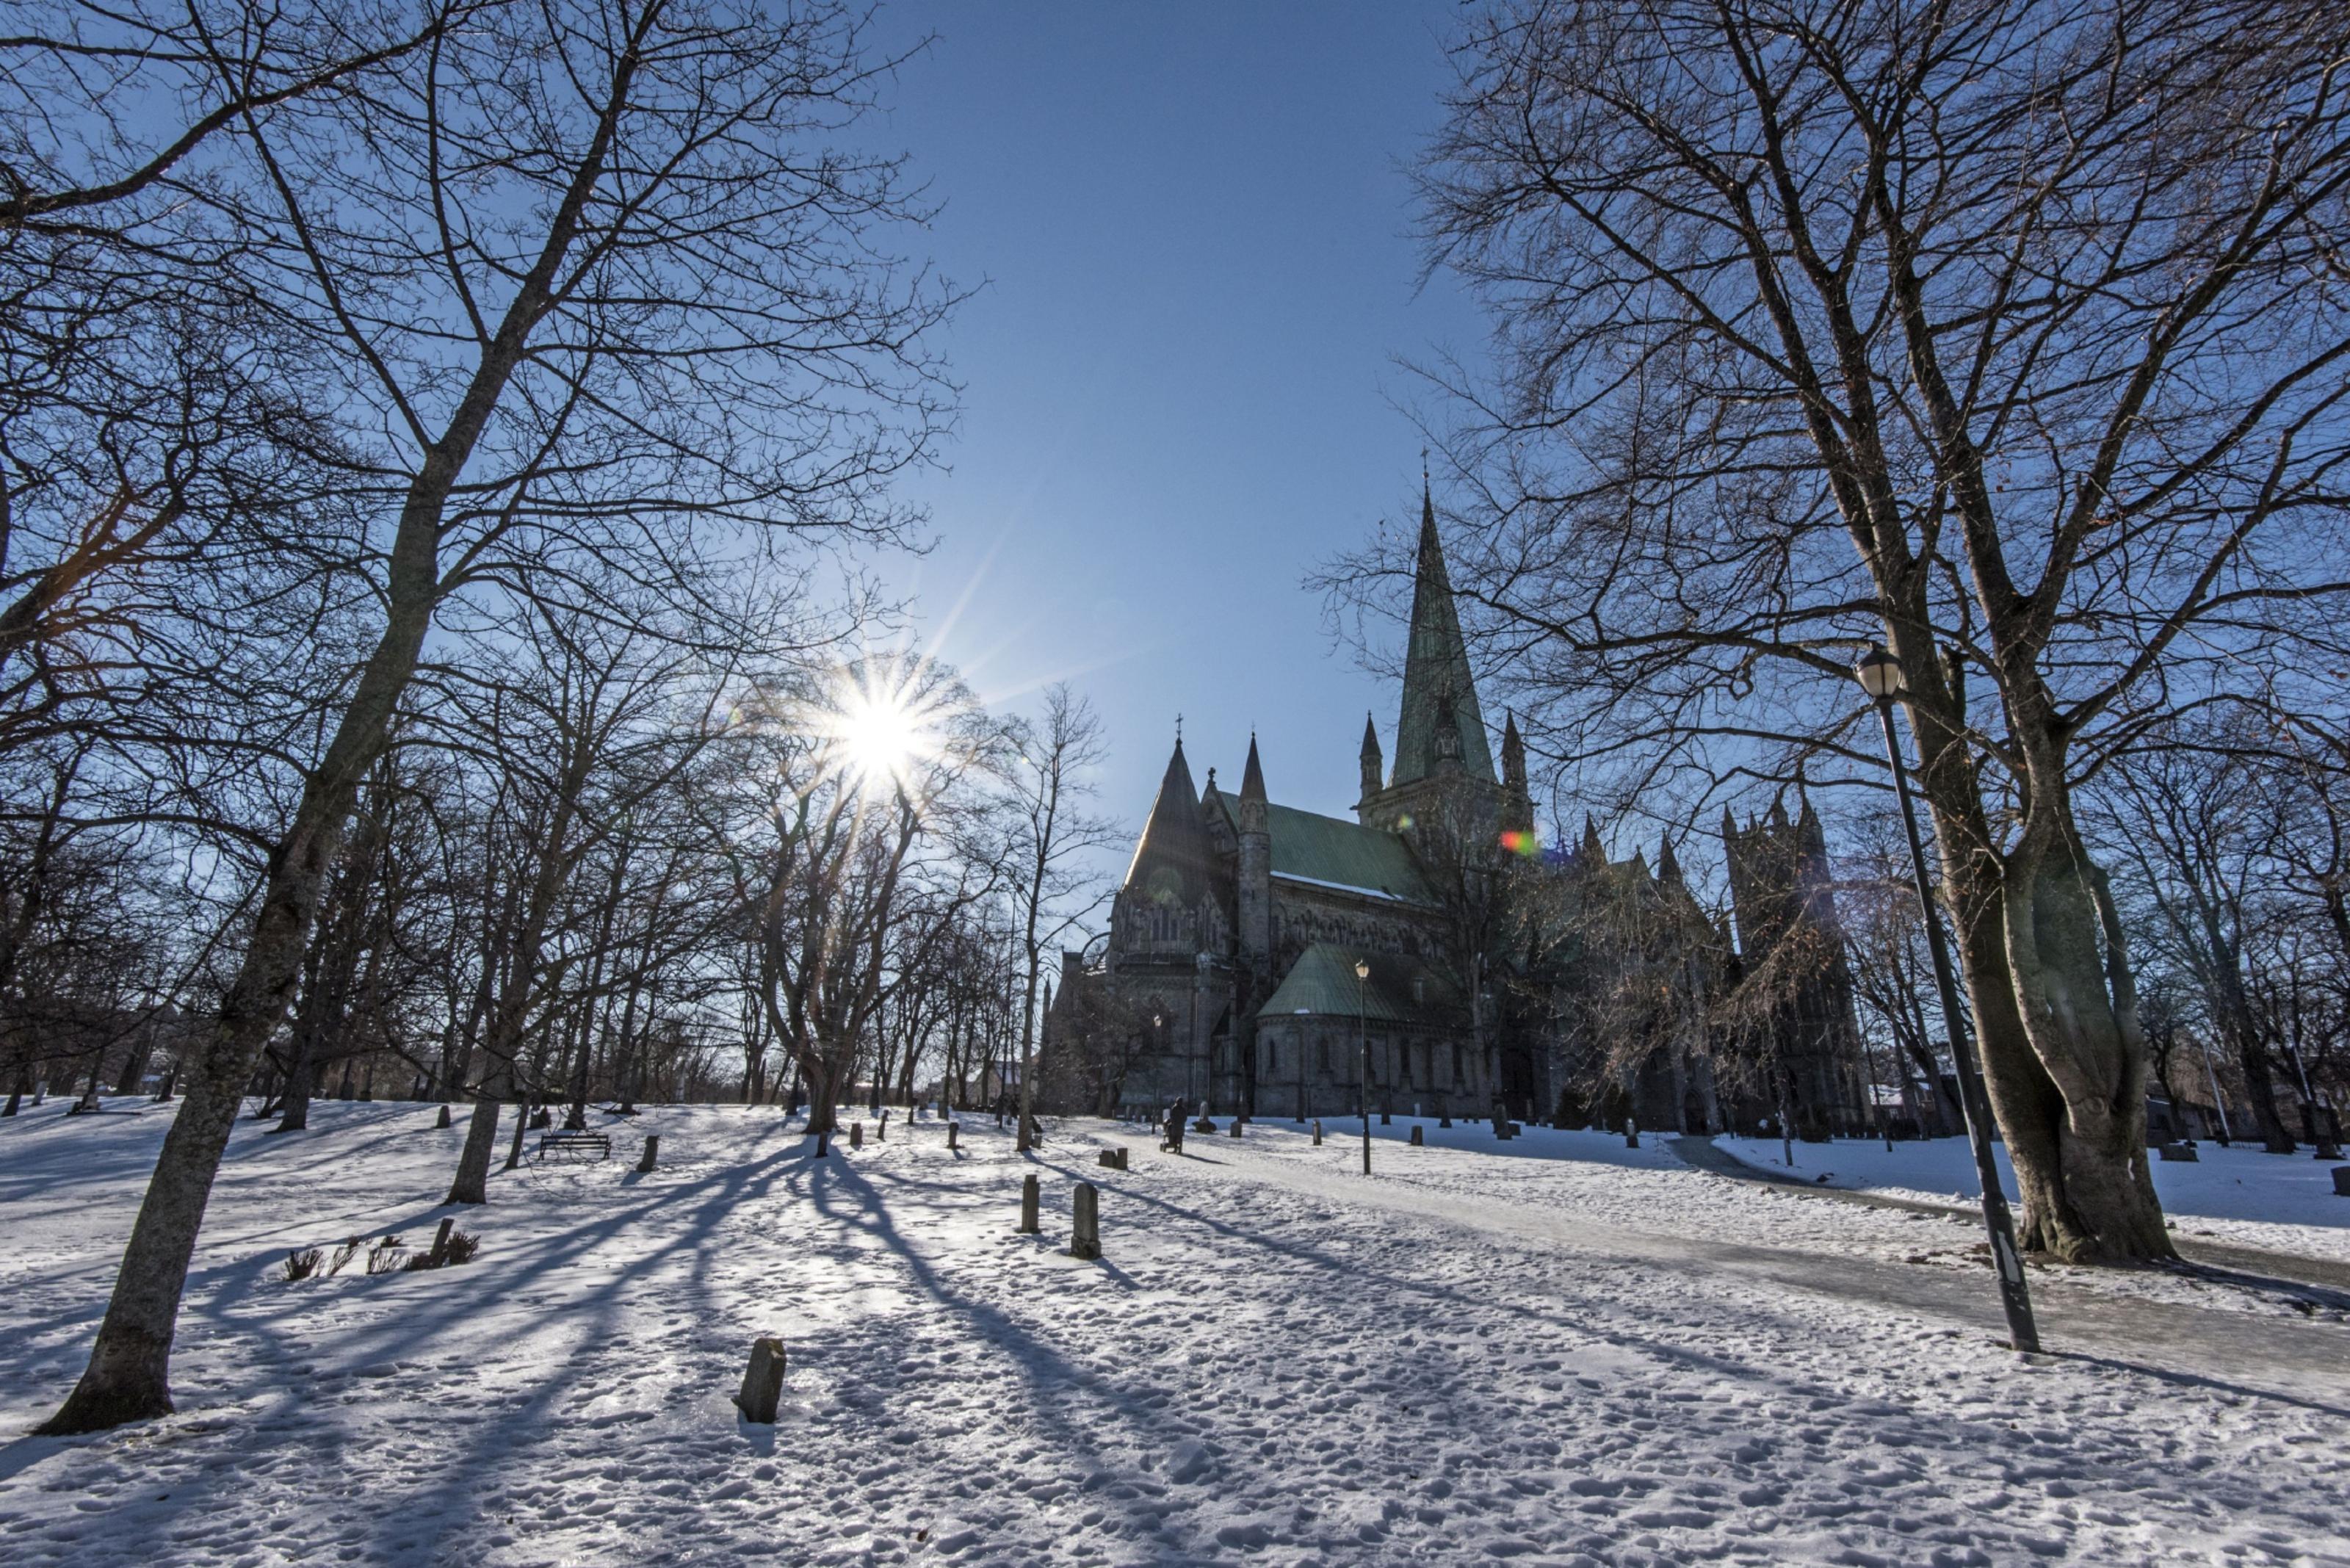 Undated Handout Photo of Nidaros Cathedral in Trondheim, Trondelag, Norway.